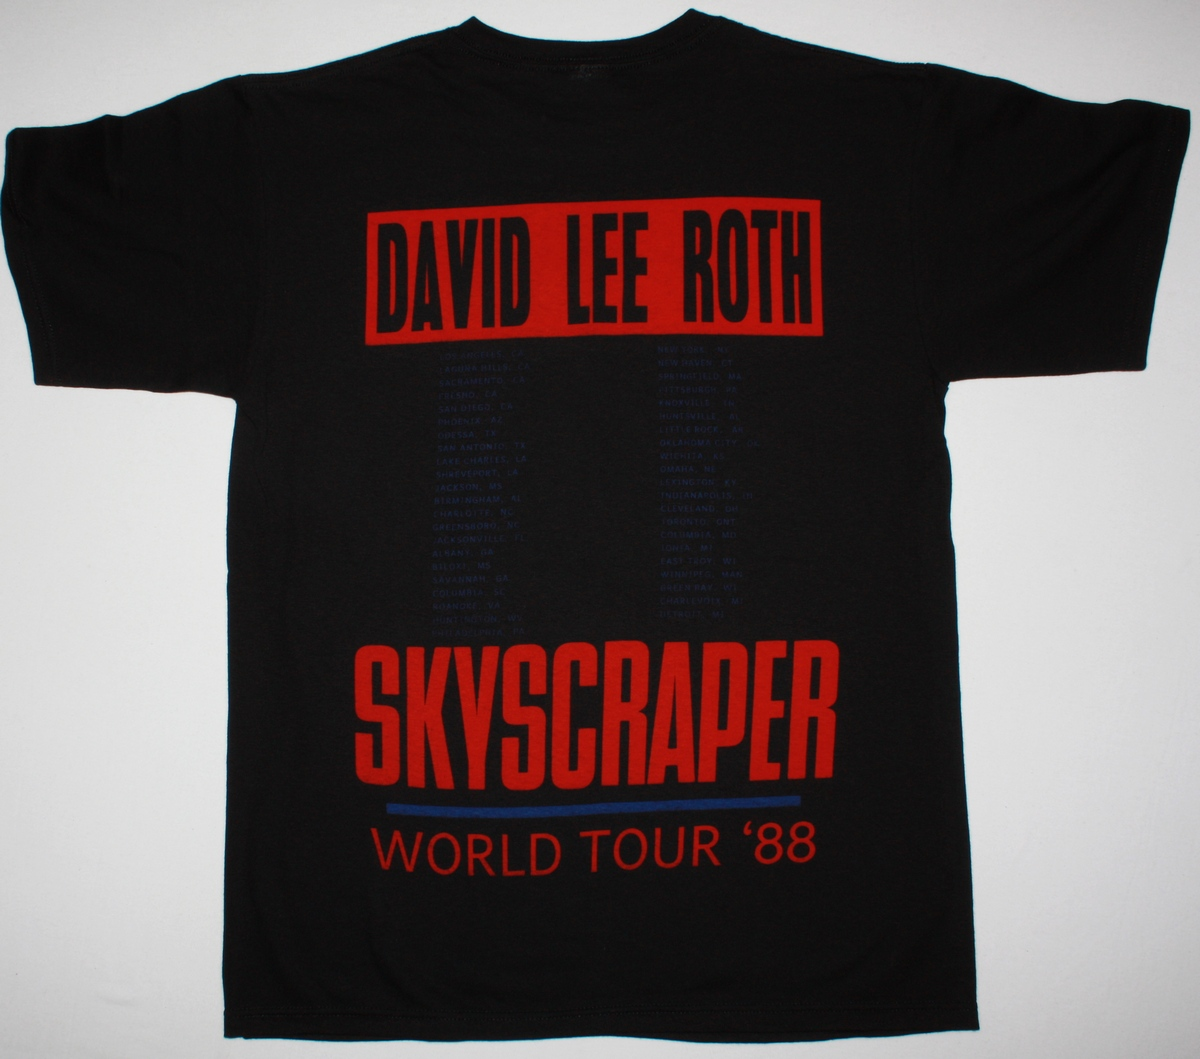 DAVID LEE ROTH SKYSCRAPER 1988 NEW BLACK T-SHIRT